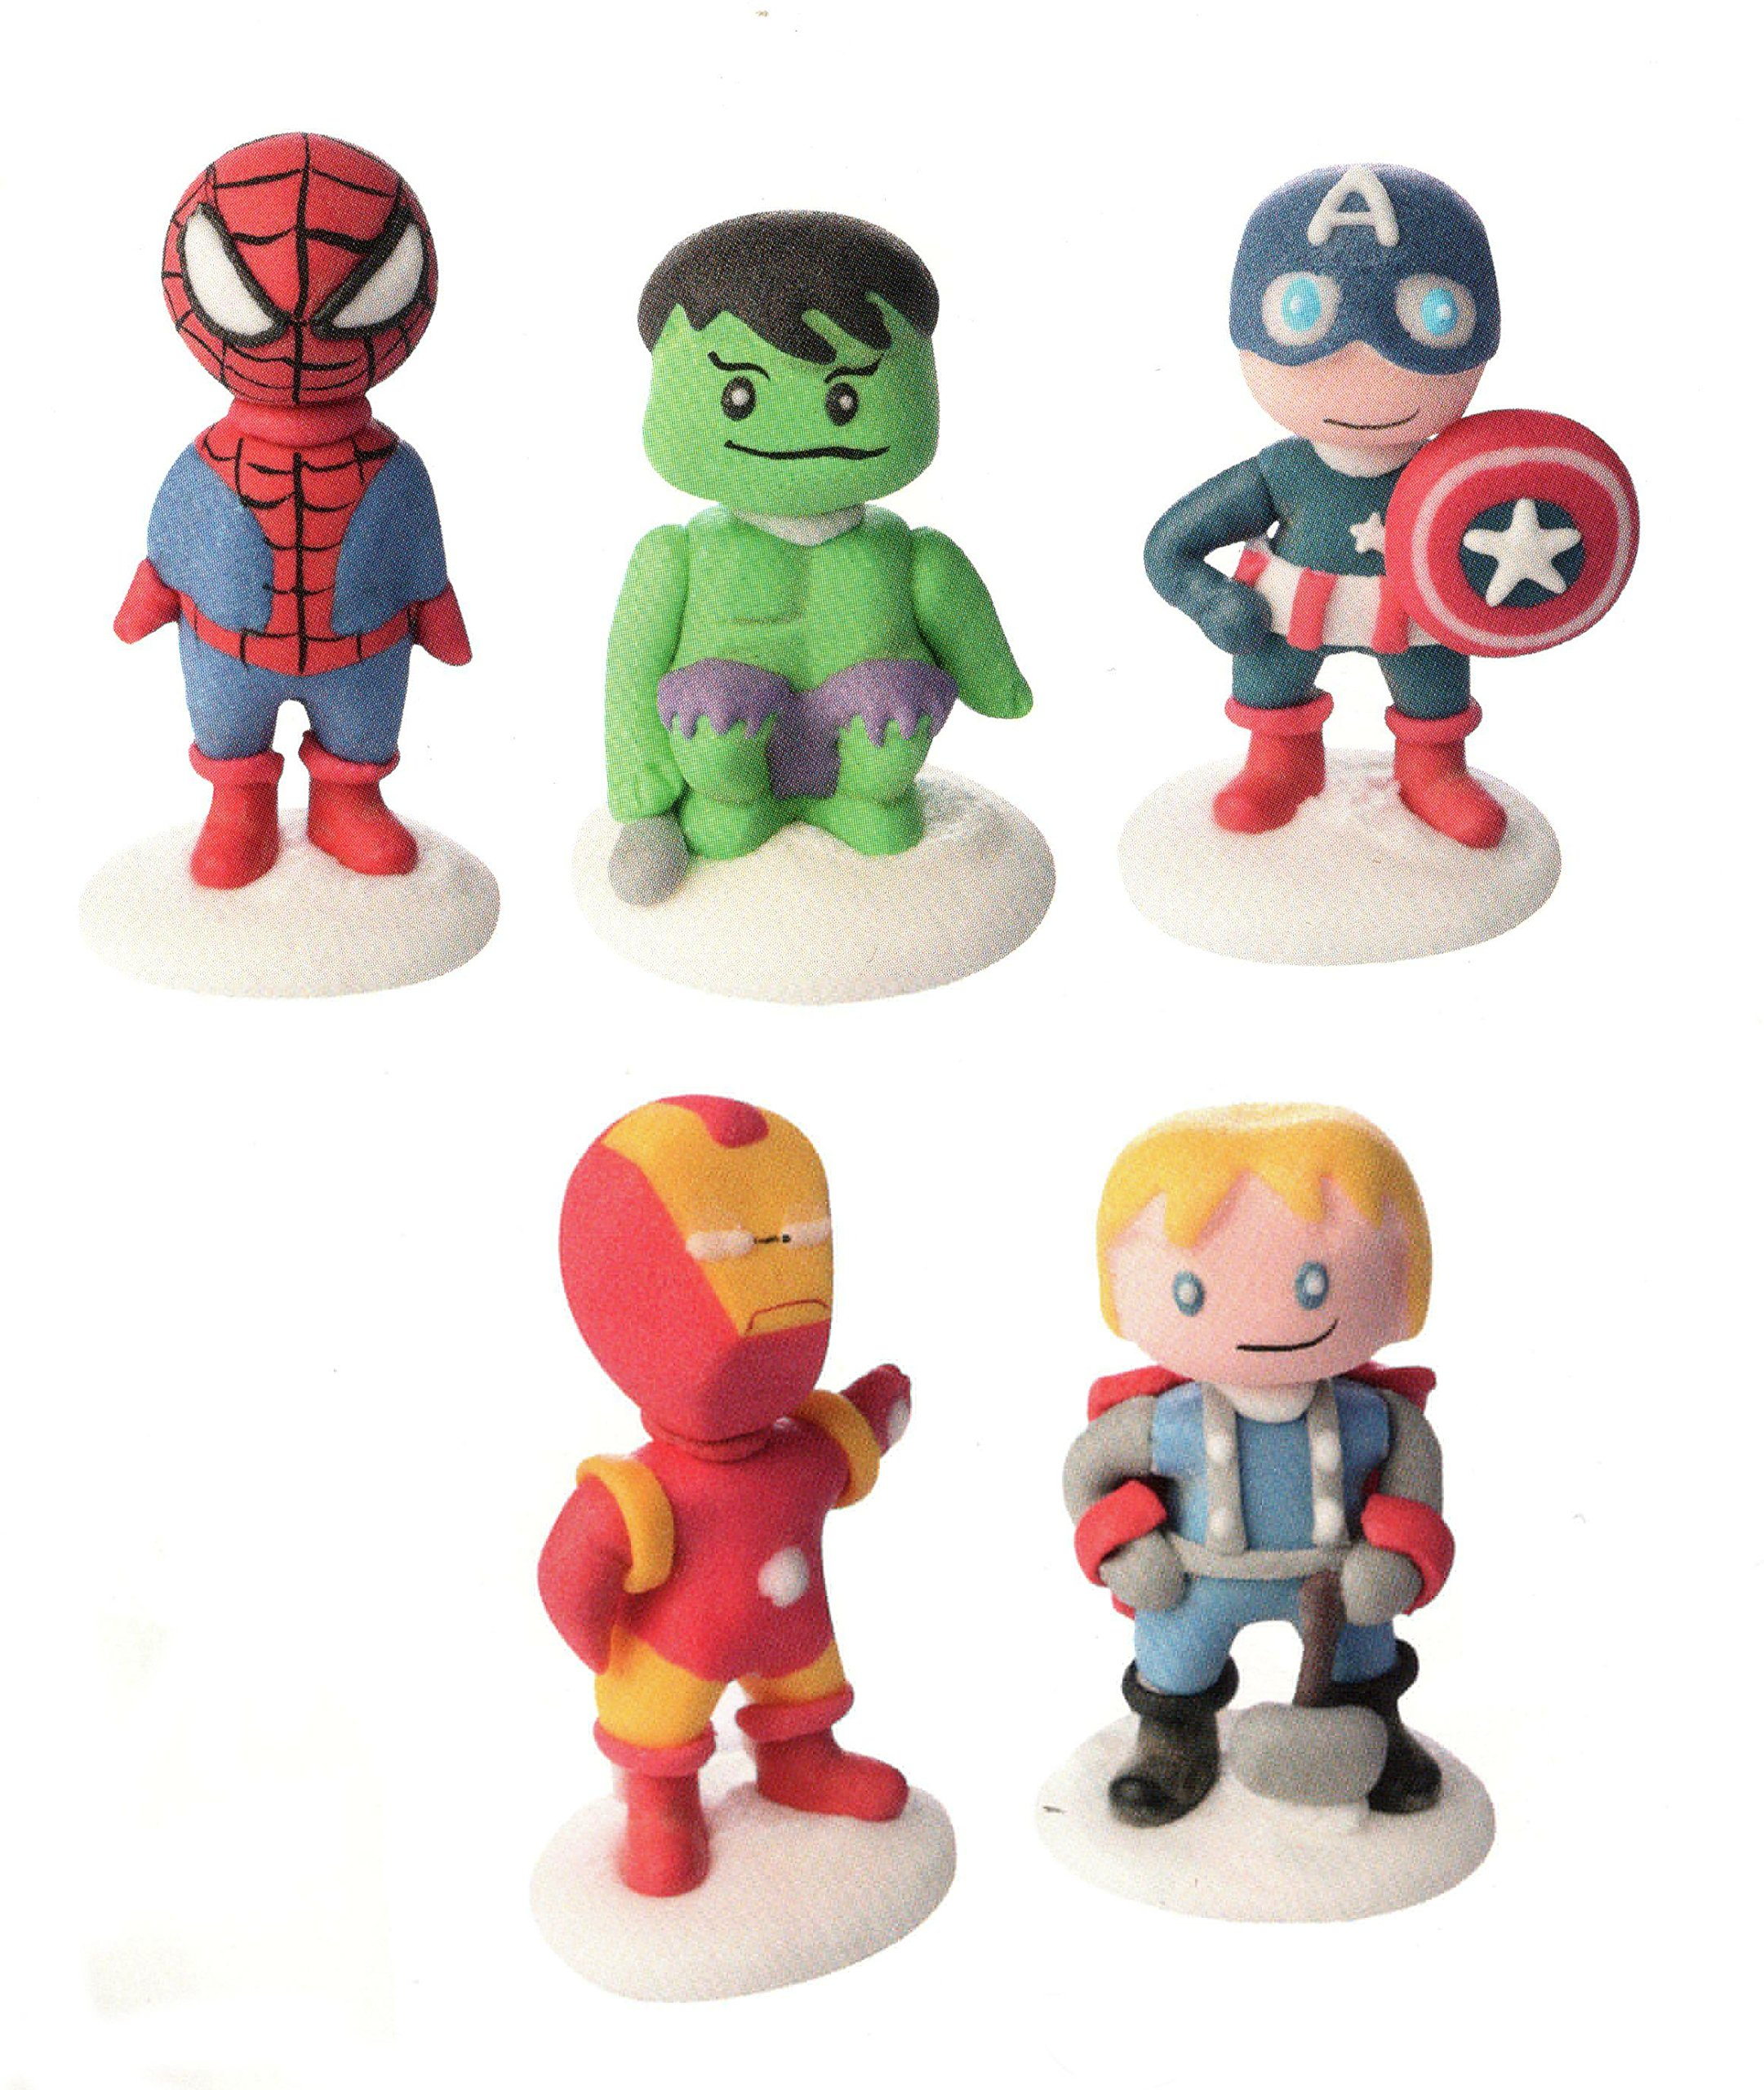 Soggetti in zucchero personaggi SUPER EROI 3D - SpiederMan, Hulk, Capitan America, IronMan, Thor - D